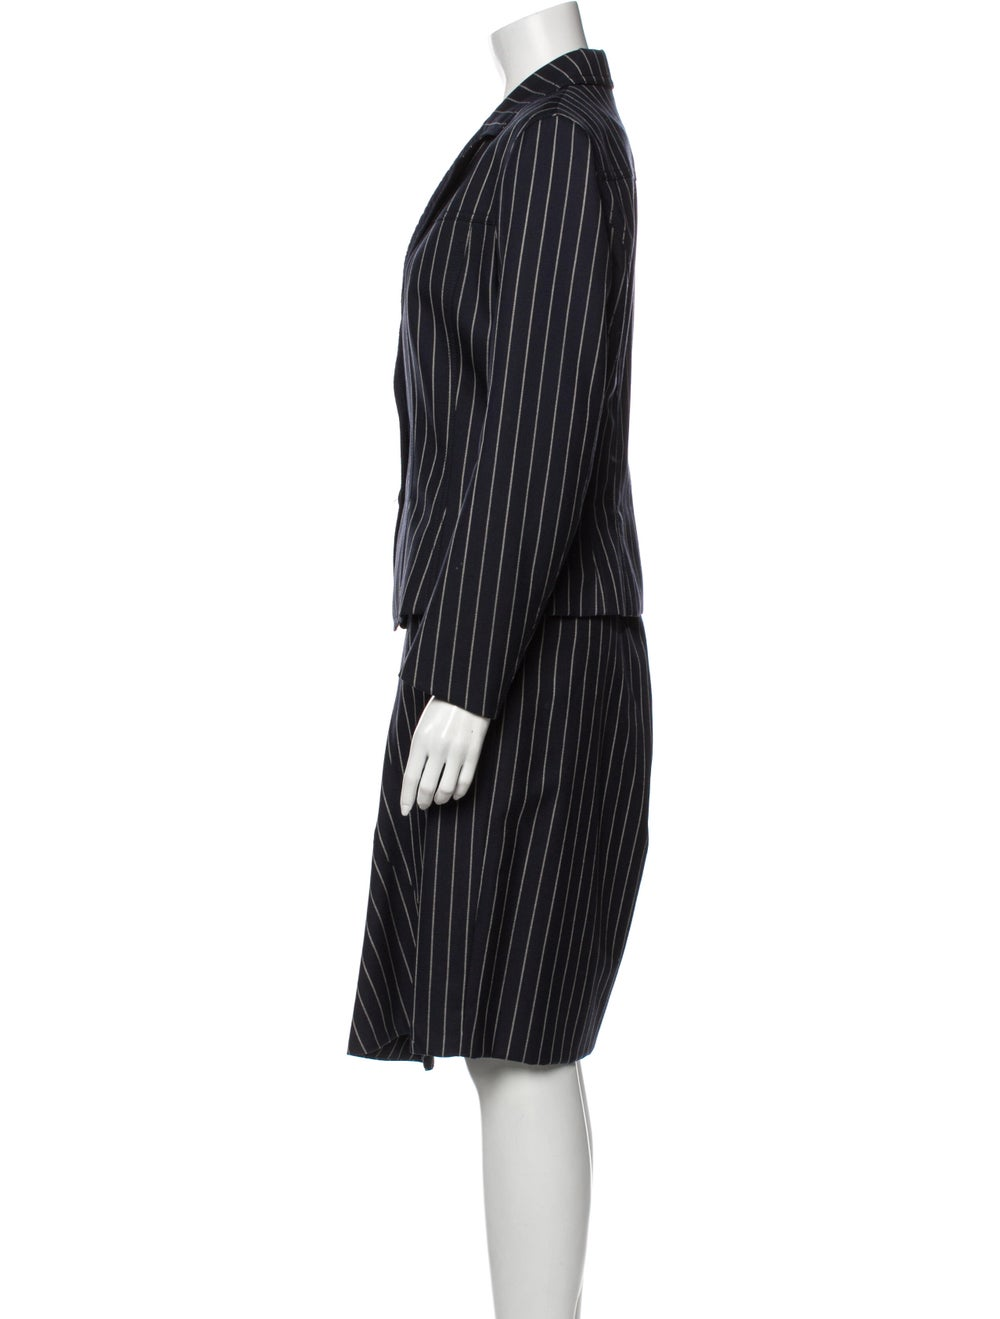 John Galliano Wool Striped Skirt Suit Wool - image 2